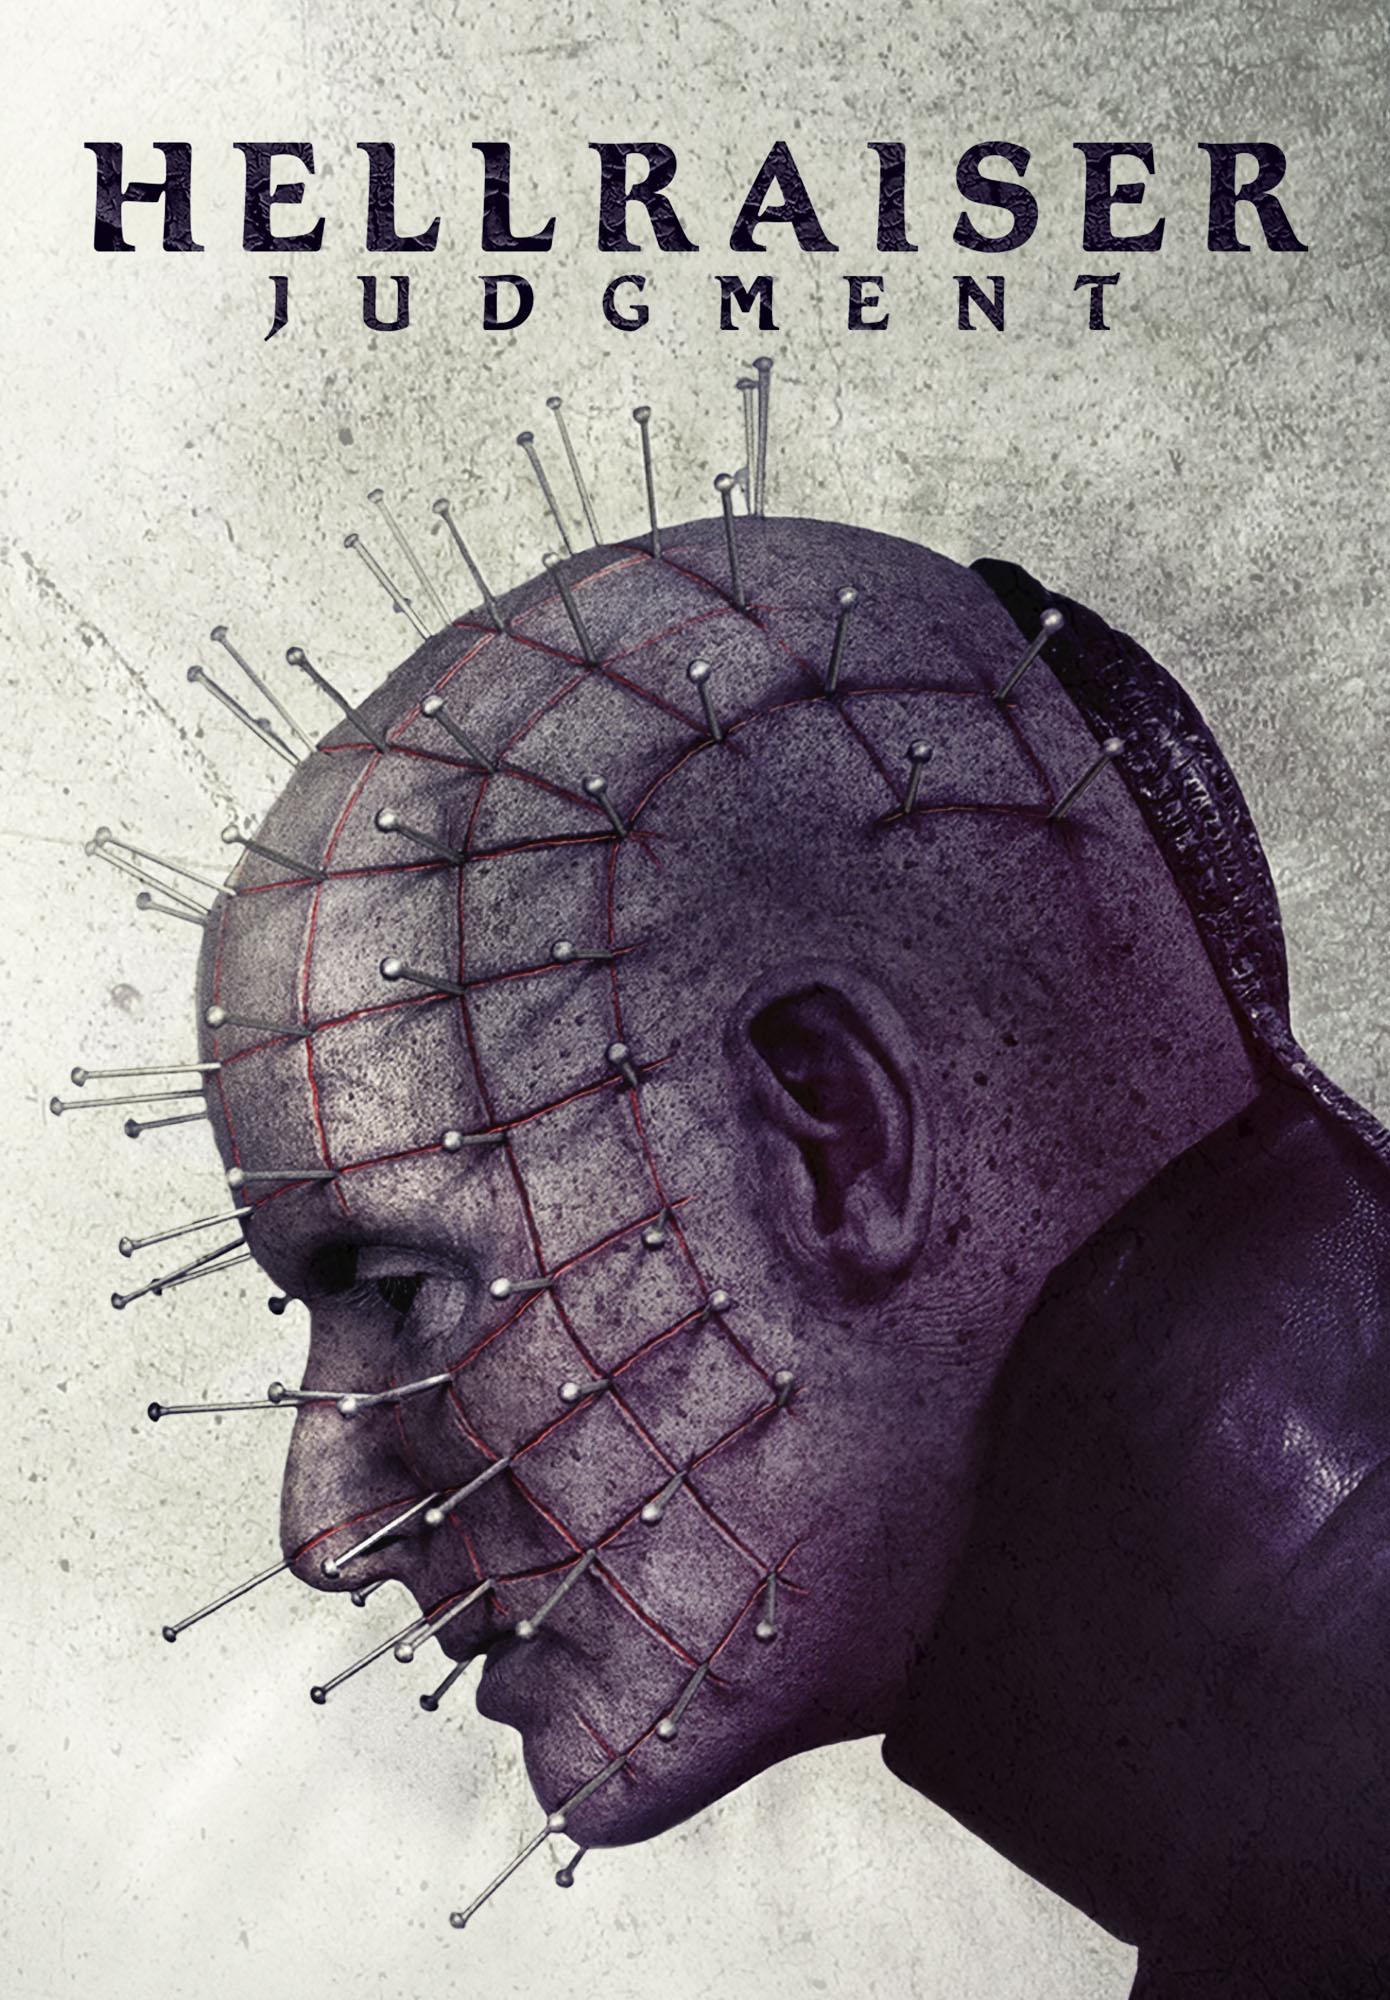 hellraiser full movie free download